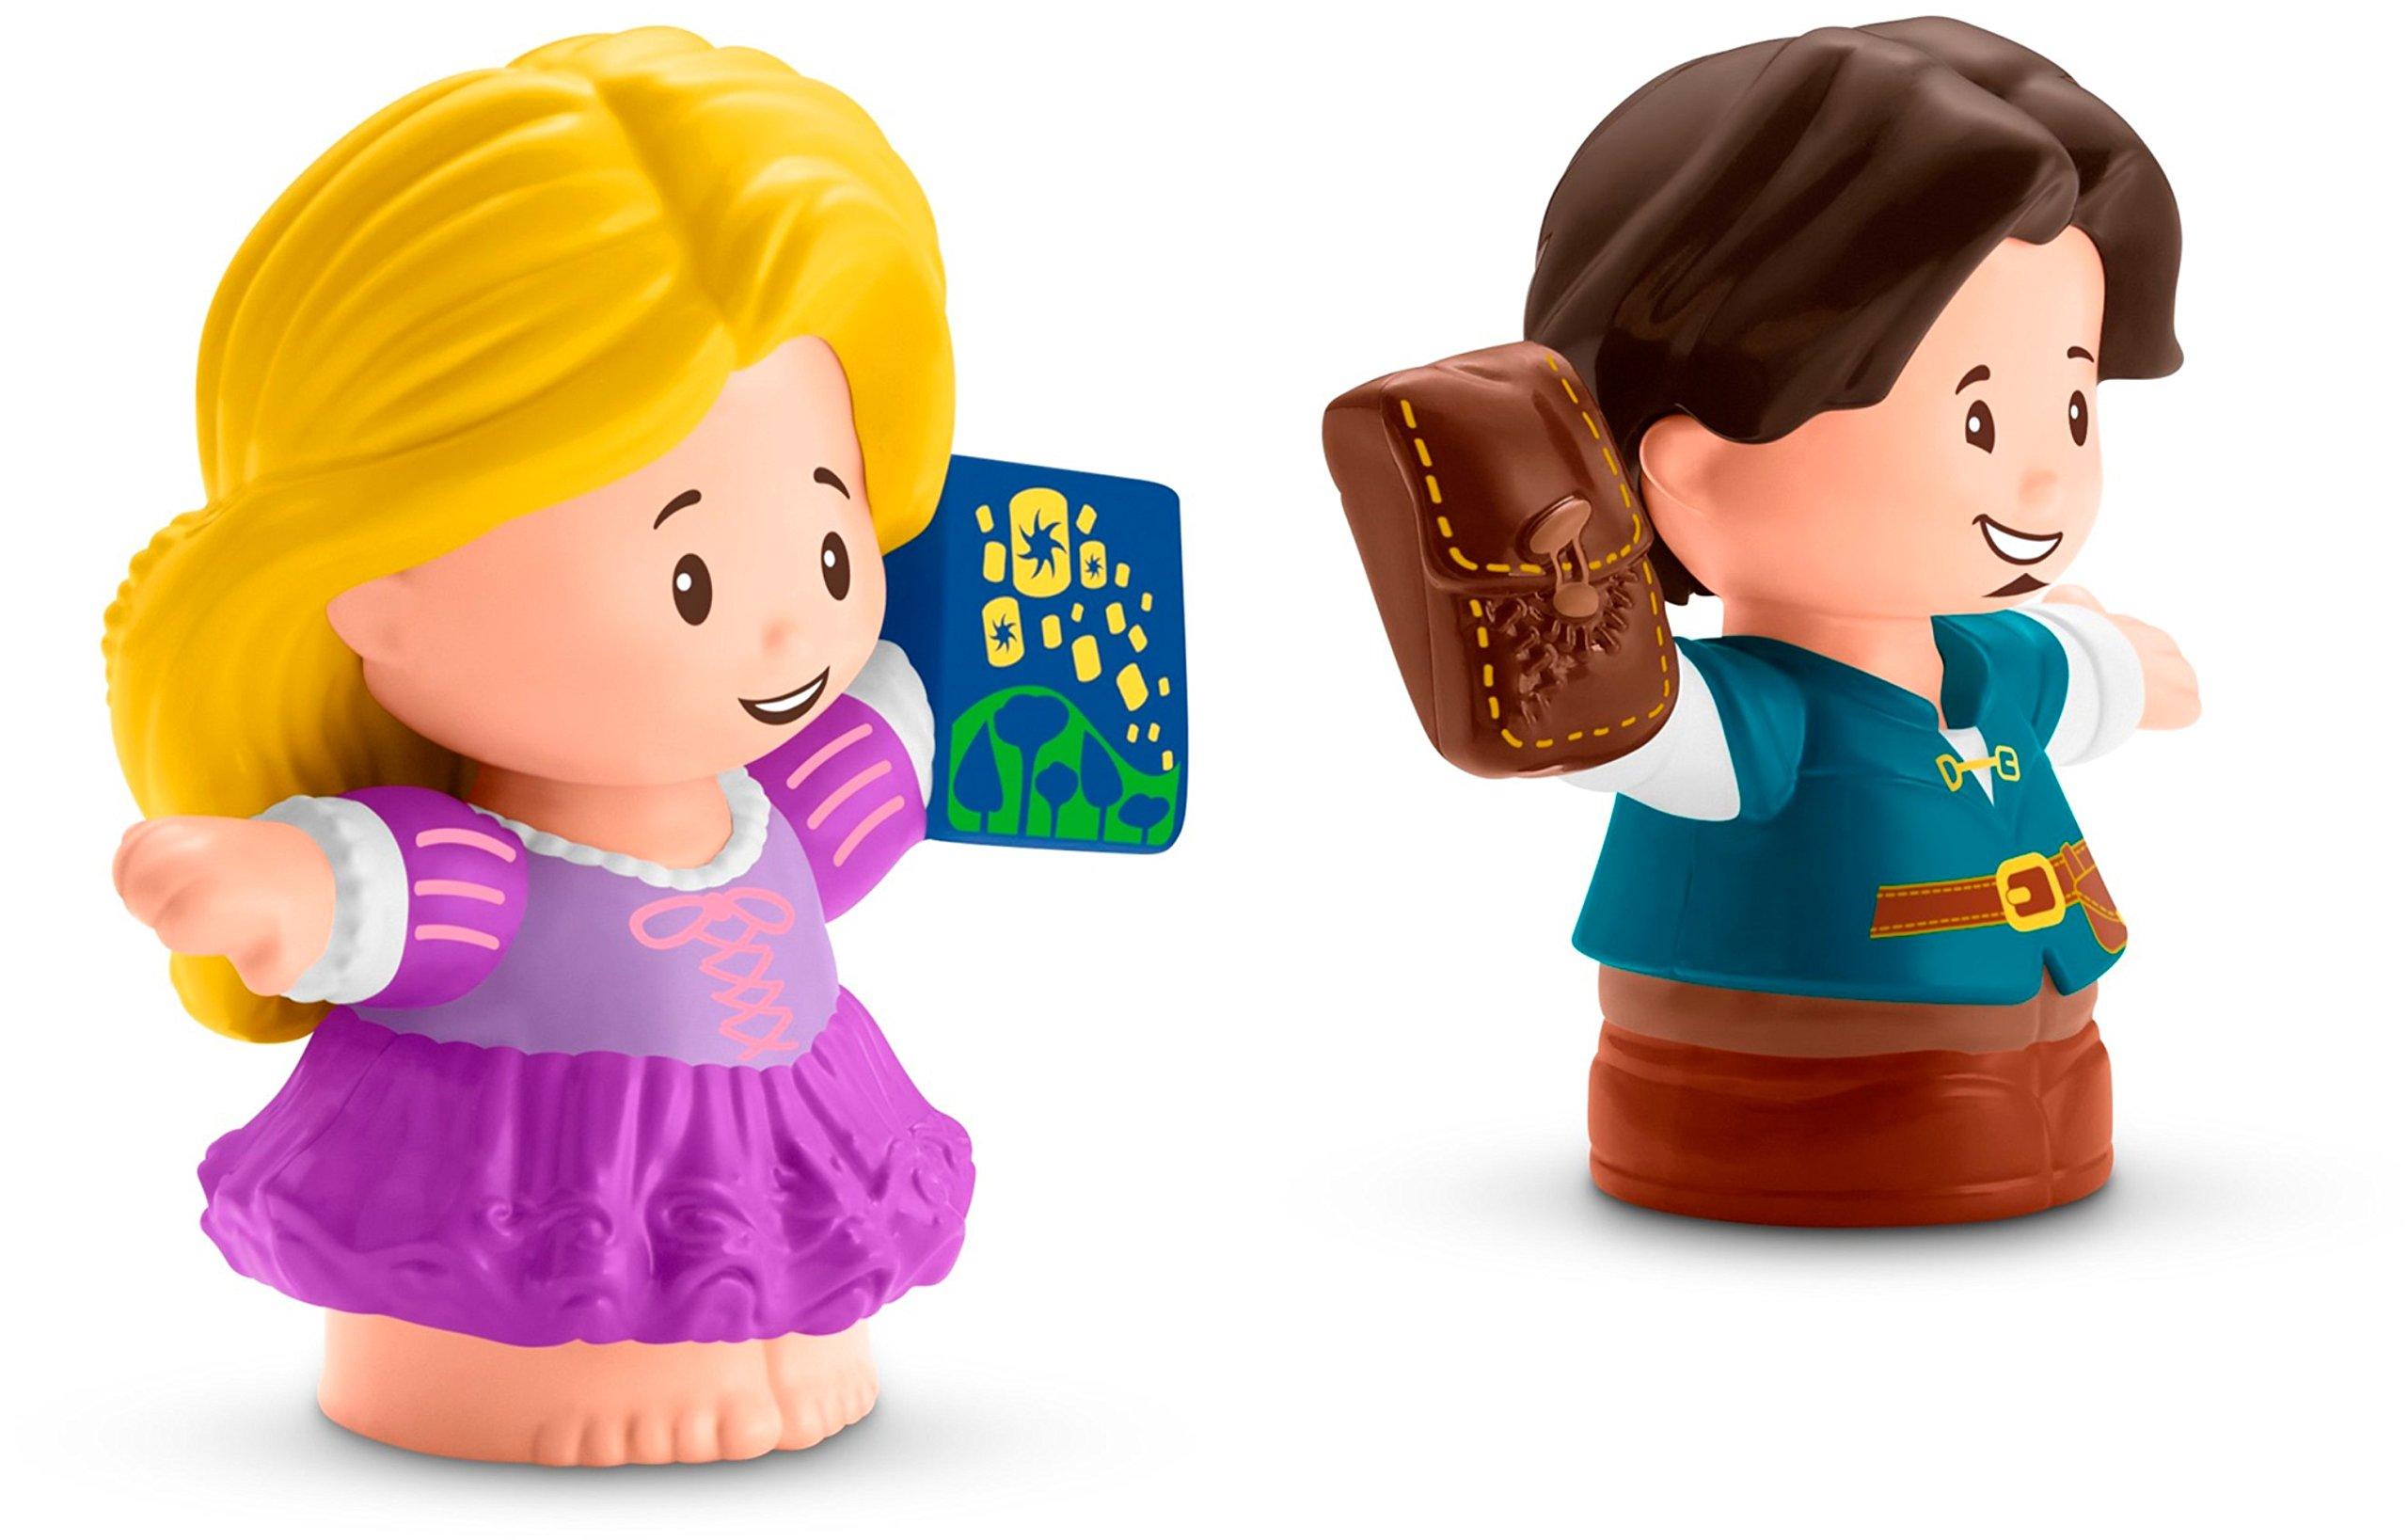 Fisher-Price Little People Disney Princess, Rapunzel & Flynn Figures